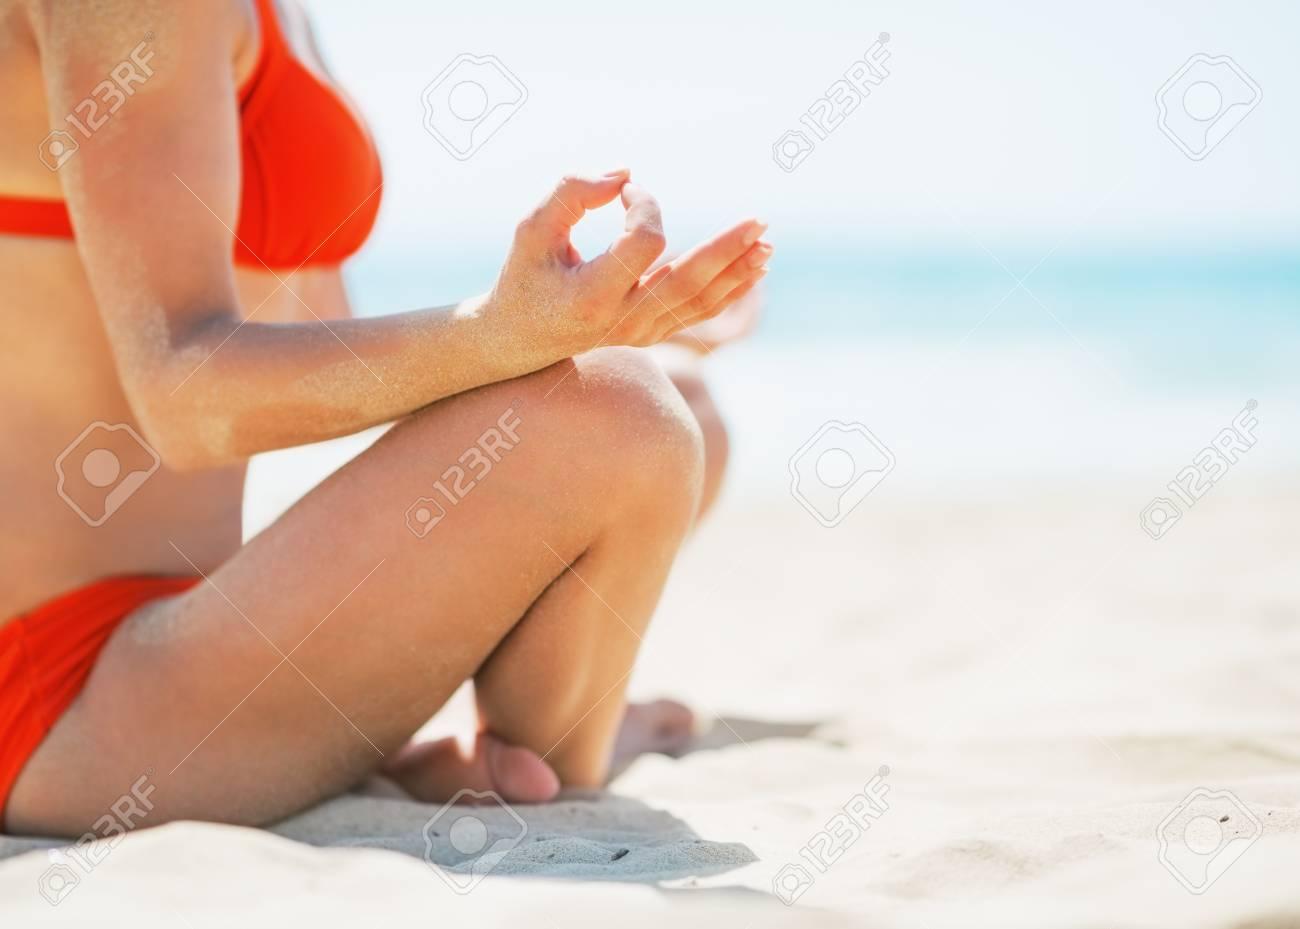 Closeup on young woman meditating on beach Stock Photo - 24913624